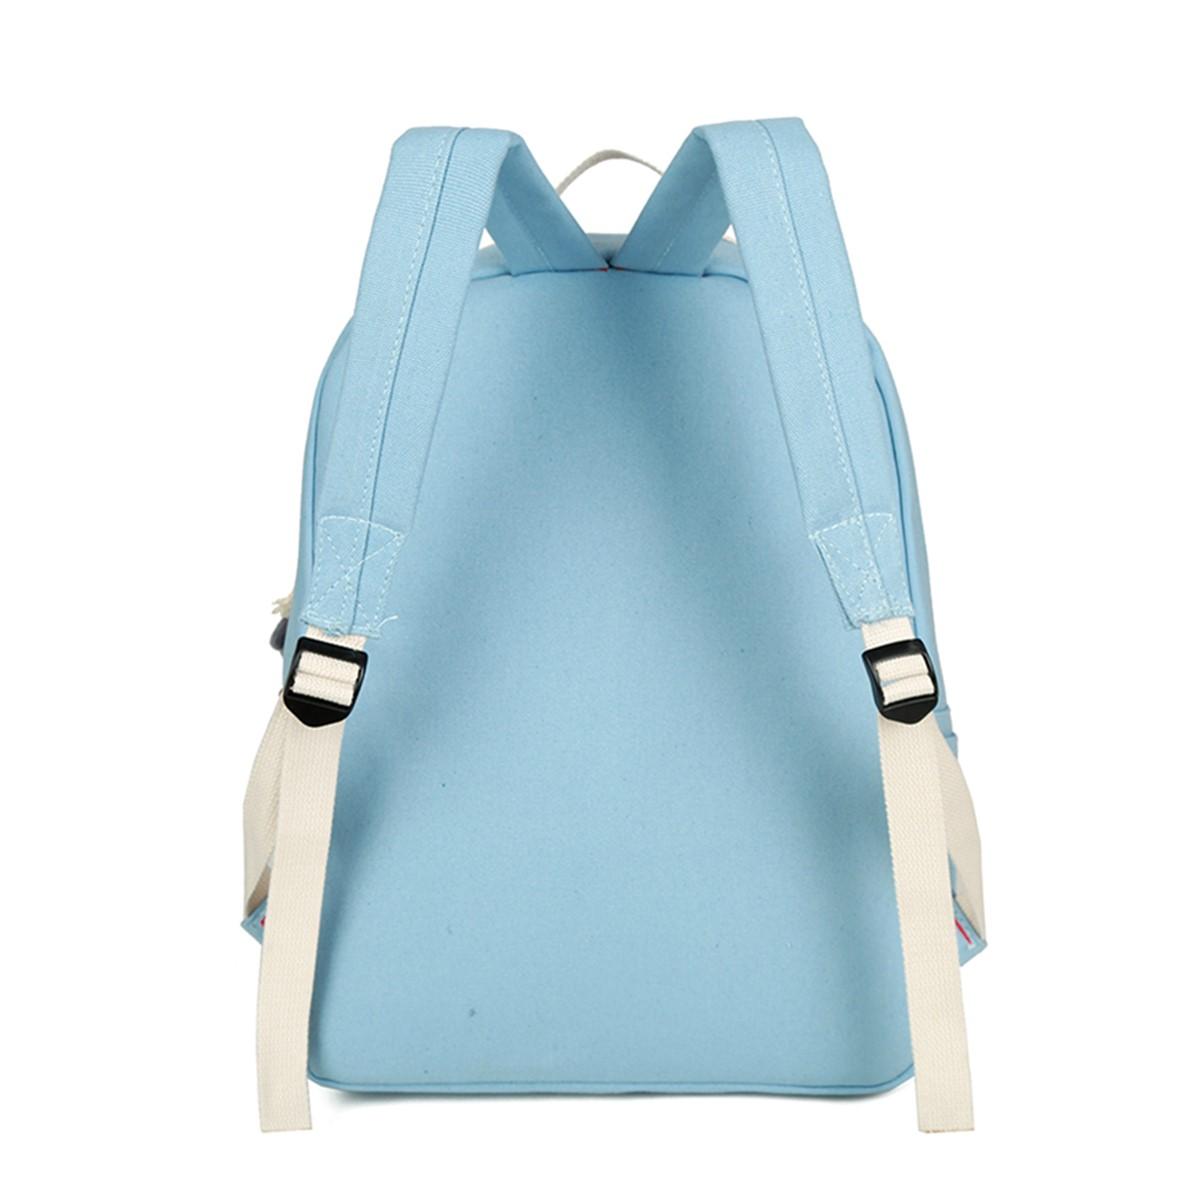 5Pcs Ultralight Canvas Panda Print Travel Backpack Rucksack School Bags for Women